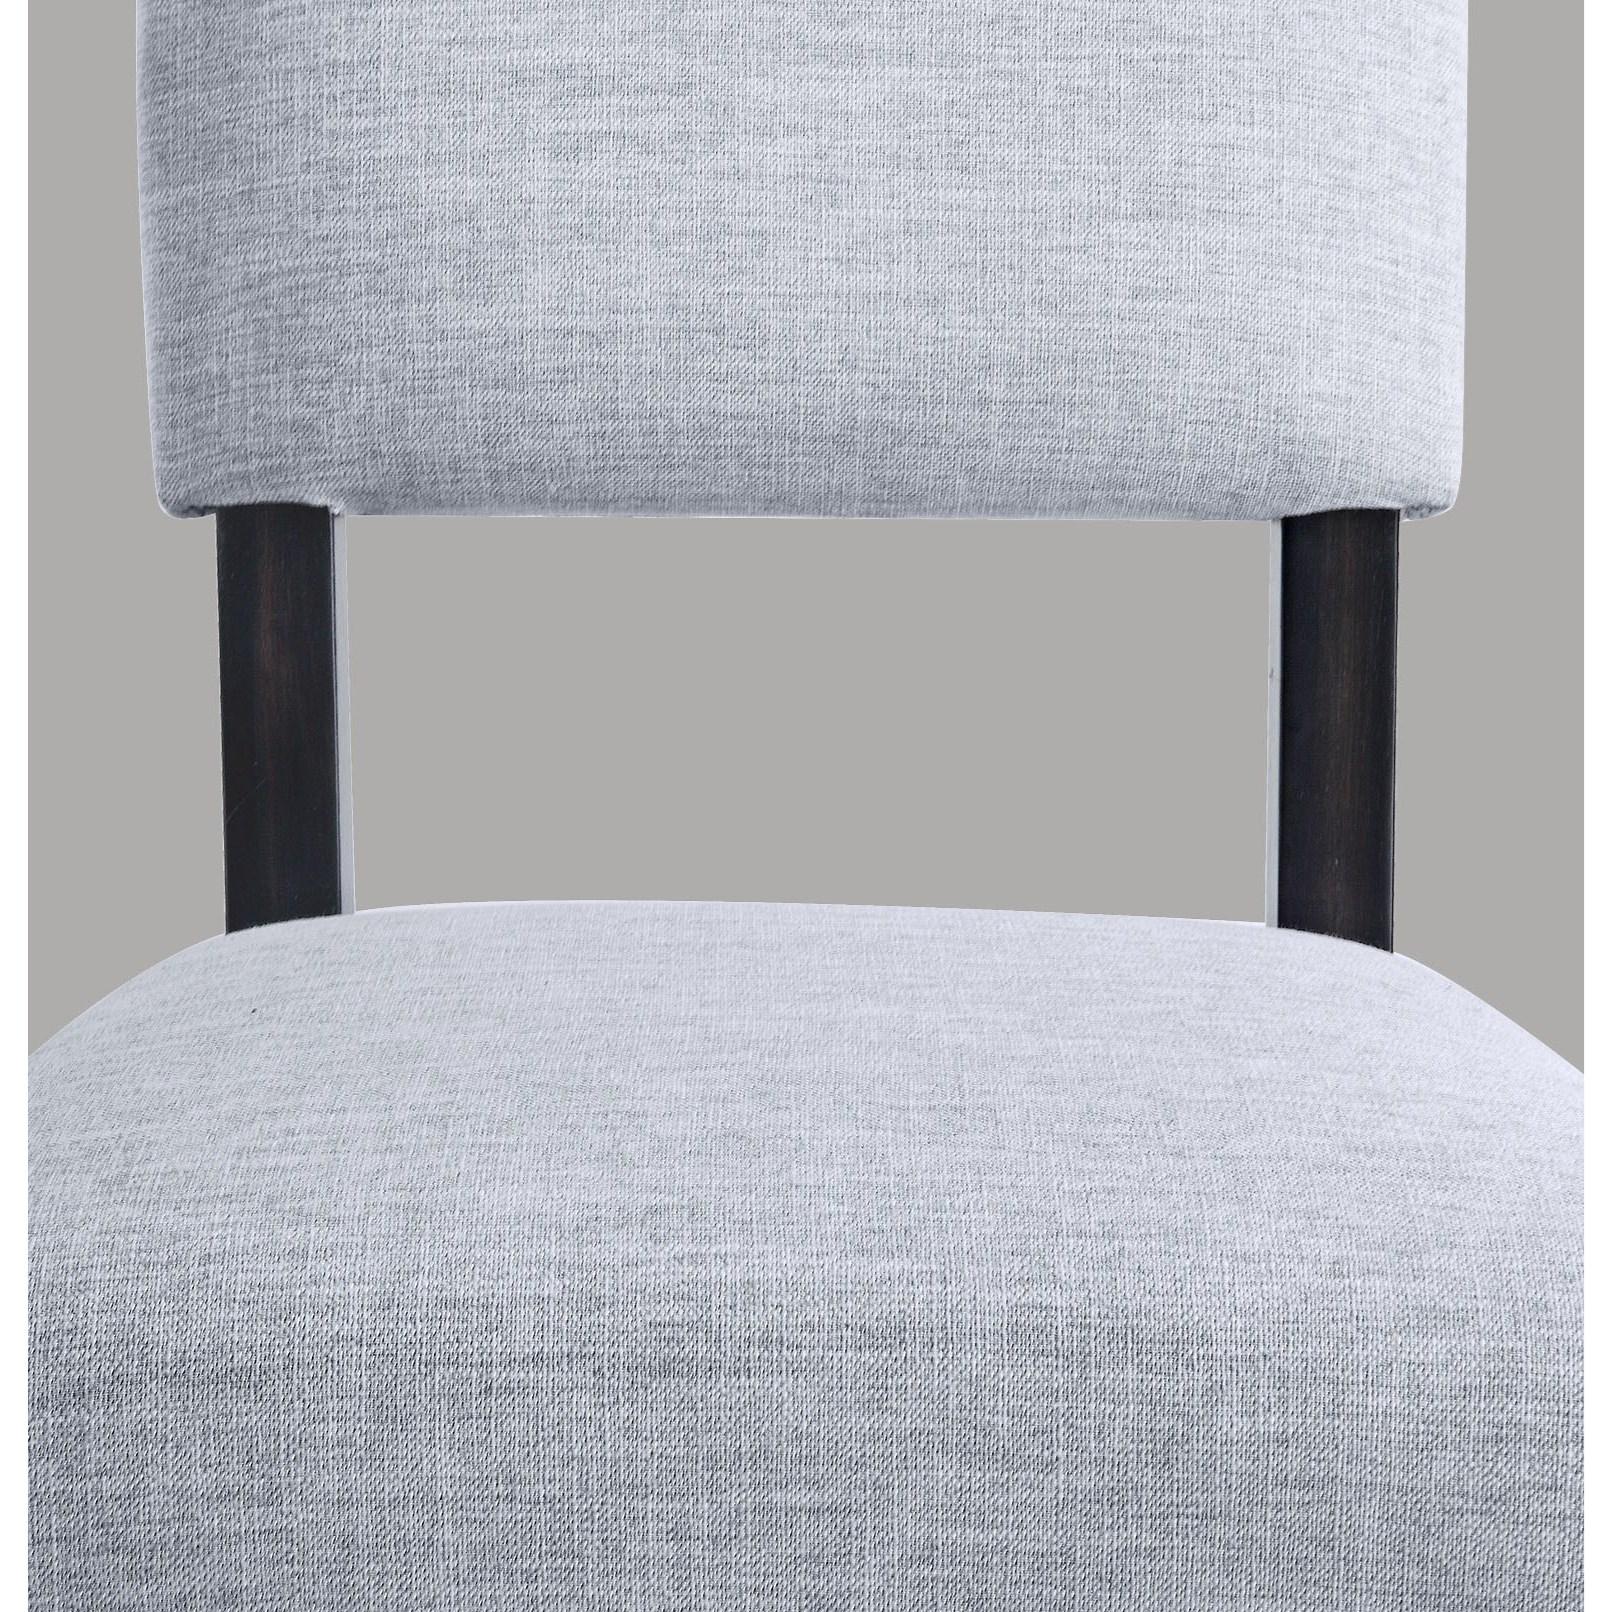 Dining Room Furniture Essentials: Belfort Essentials Maya Contemporary Dining Side Chair